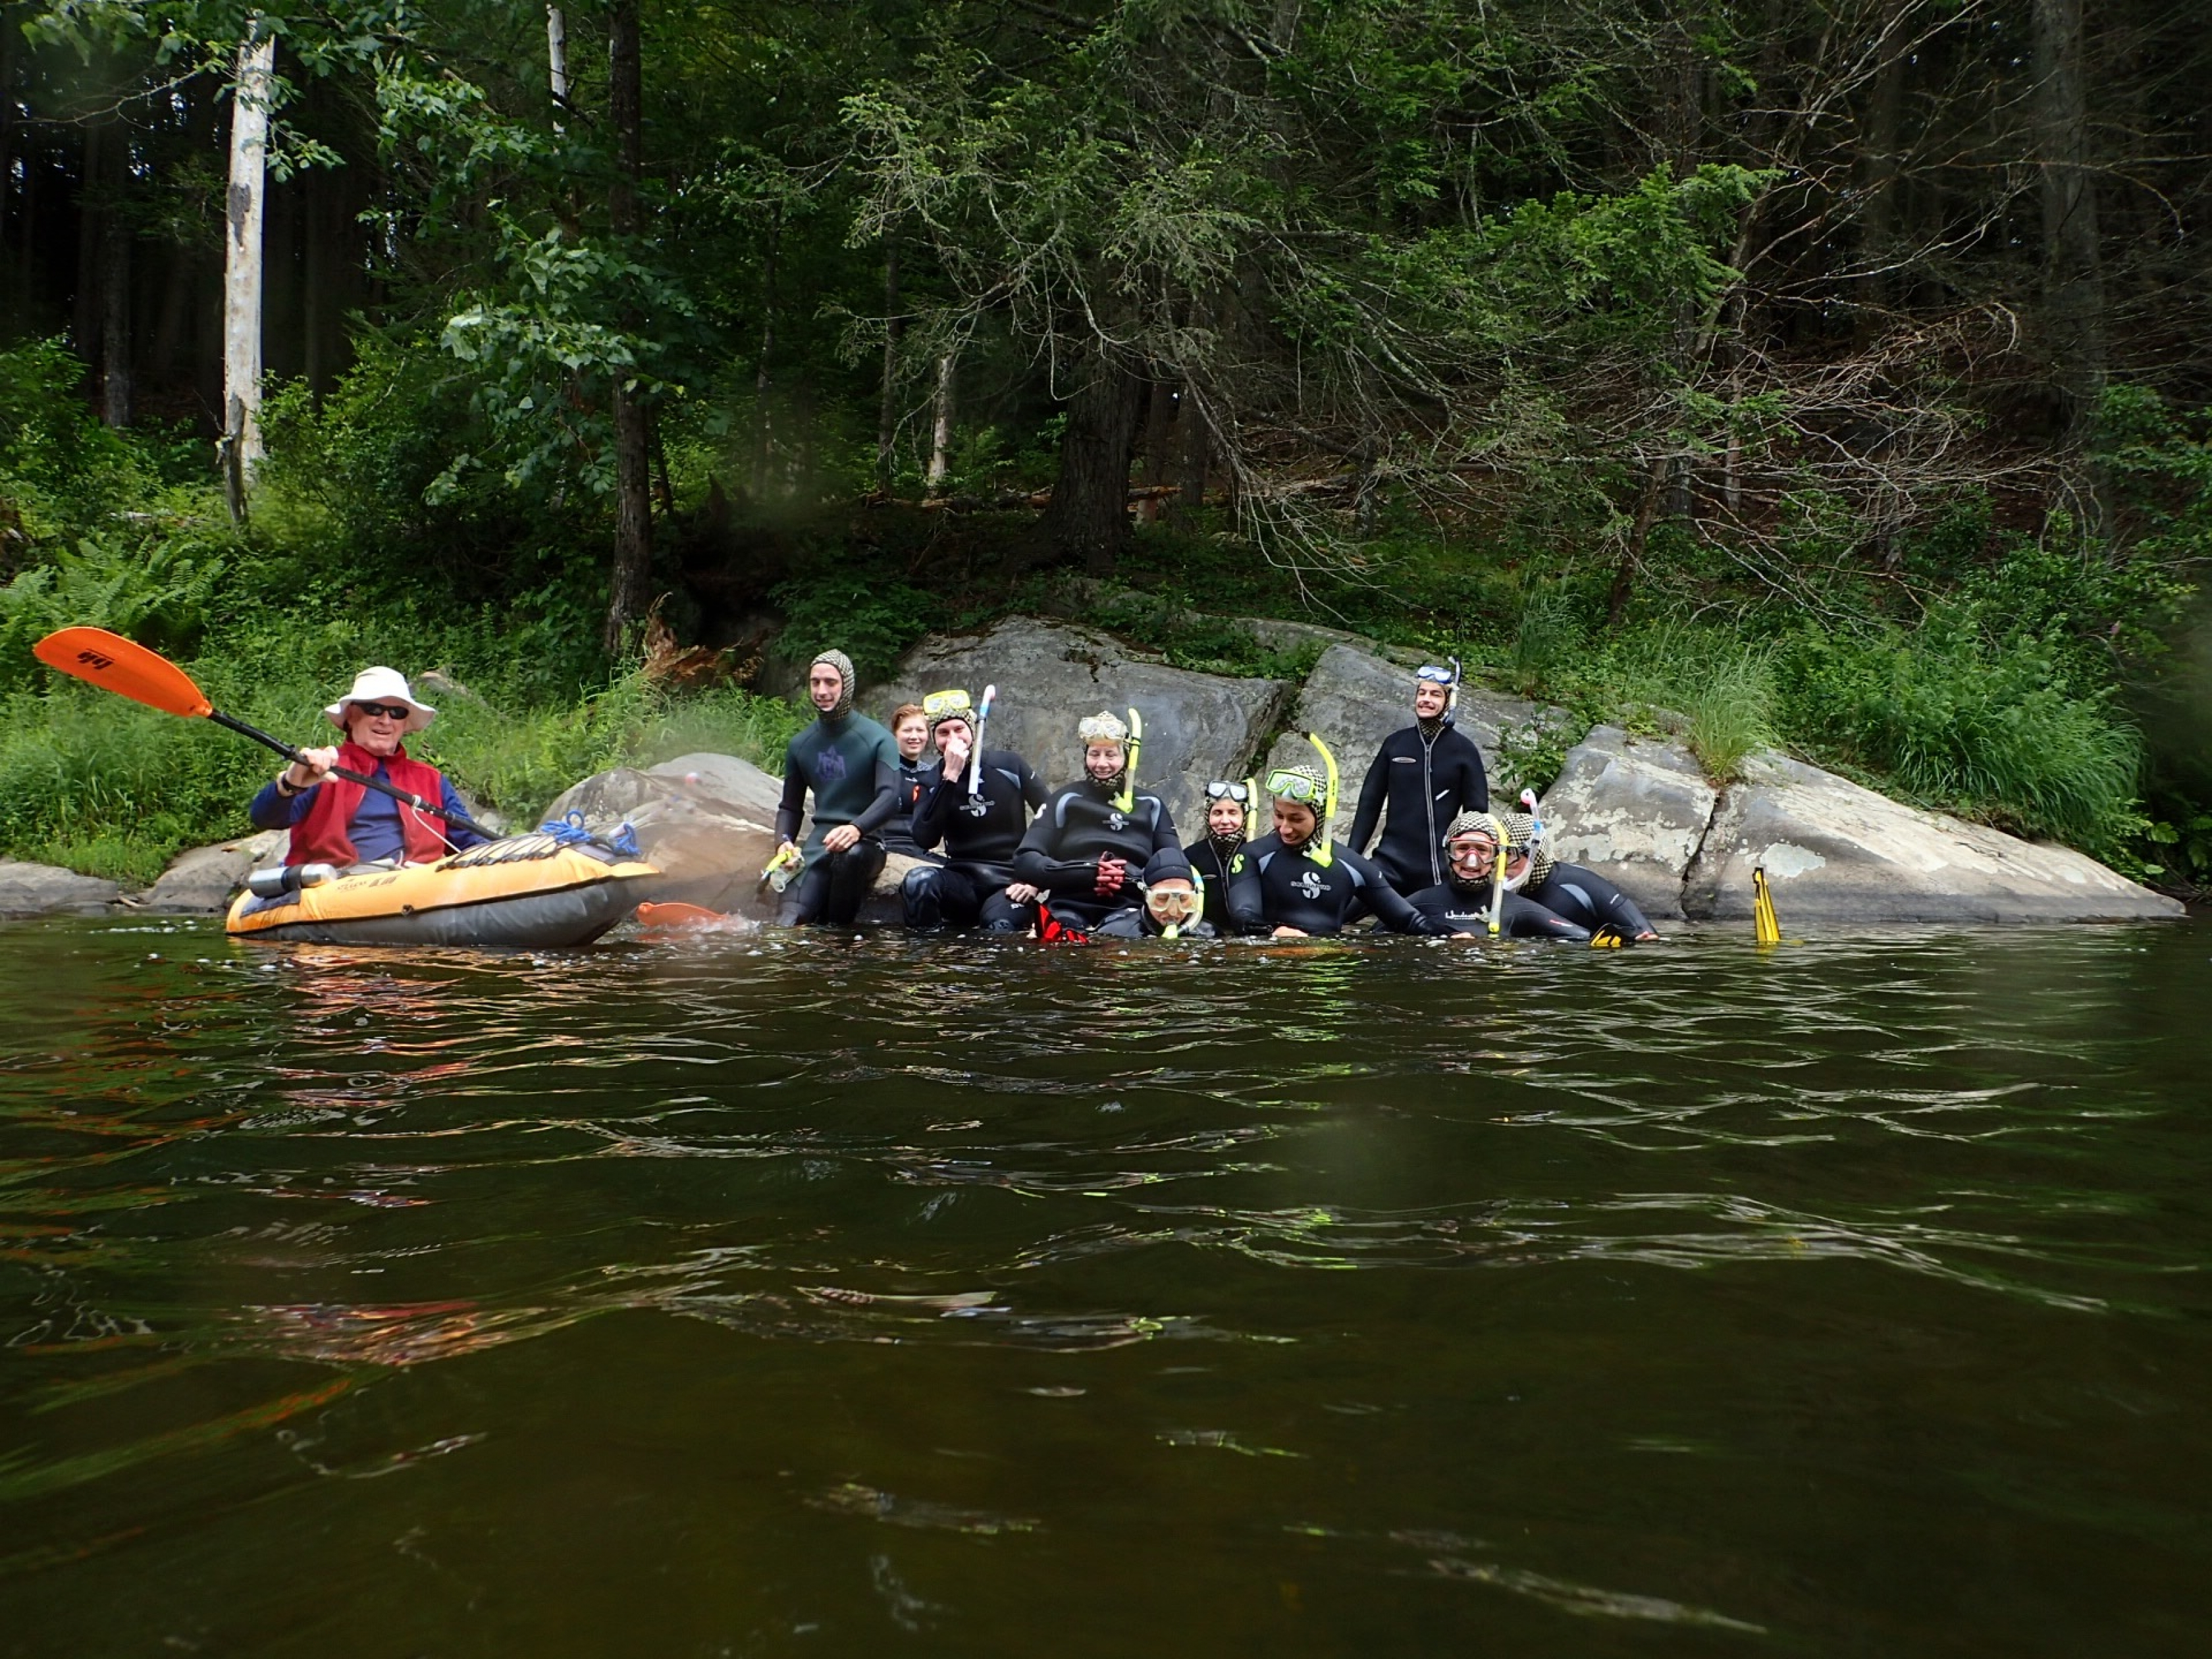 Grupo de buceadores y un kayakista en Wild & Scenic Westfield River